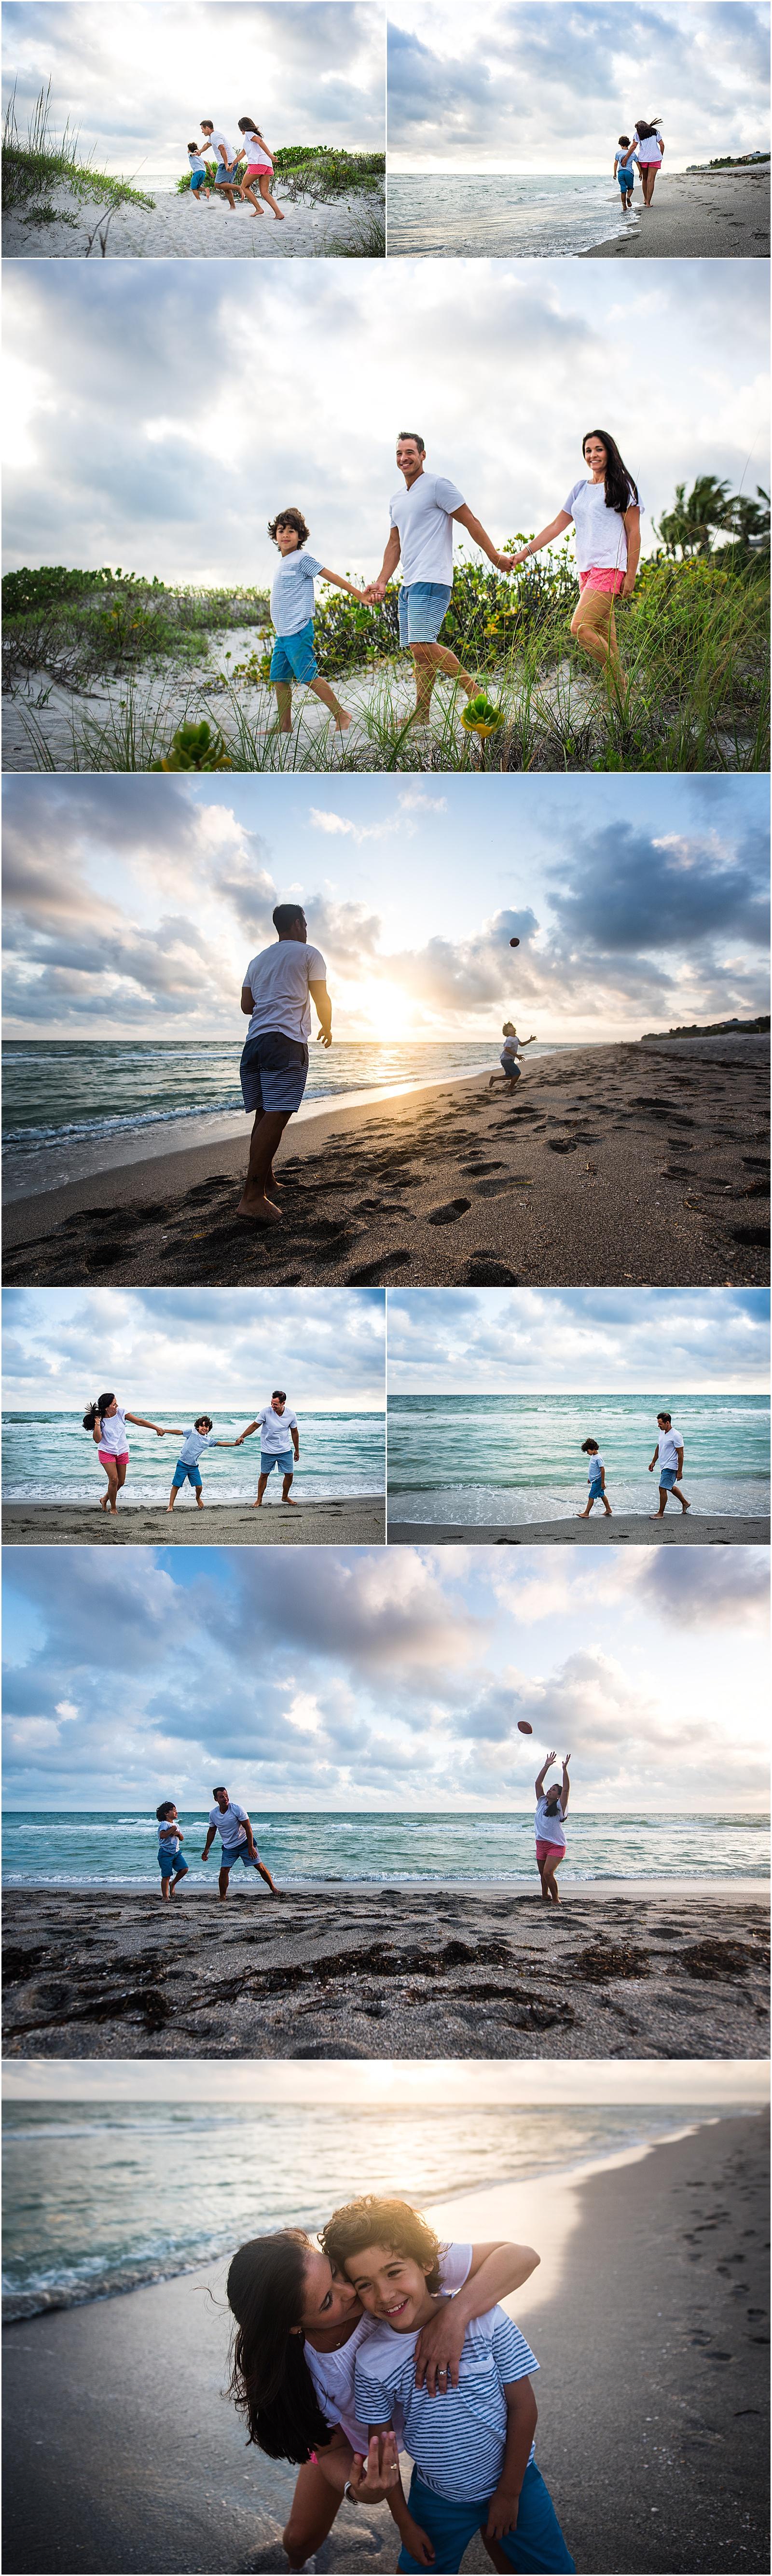 Beach_Friends3.jpg